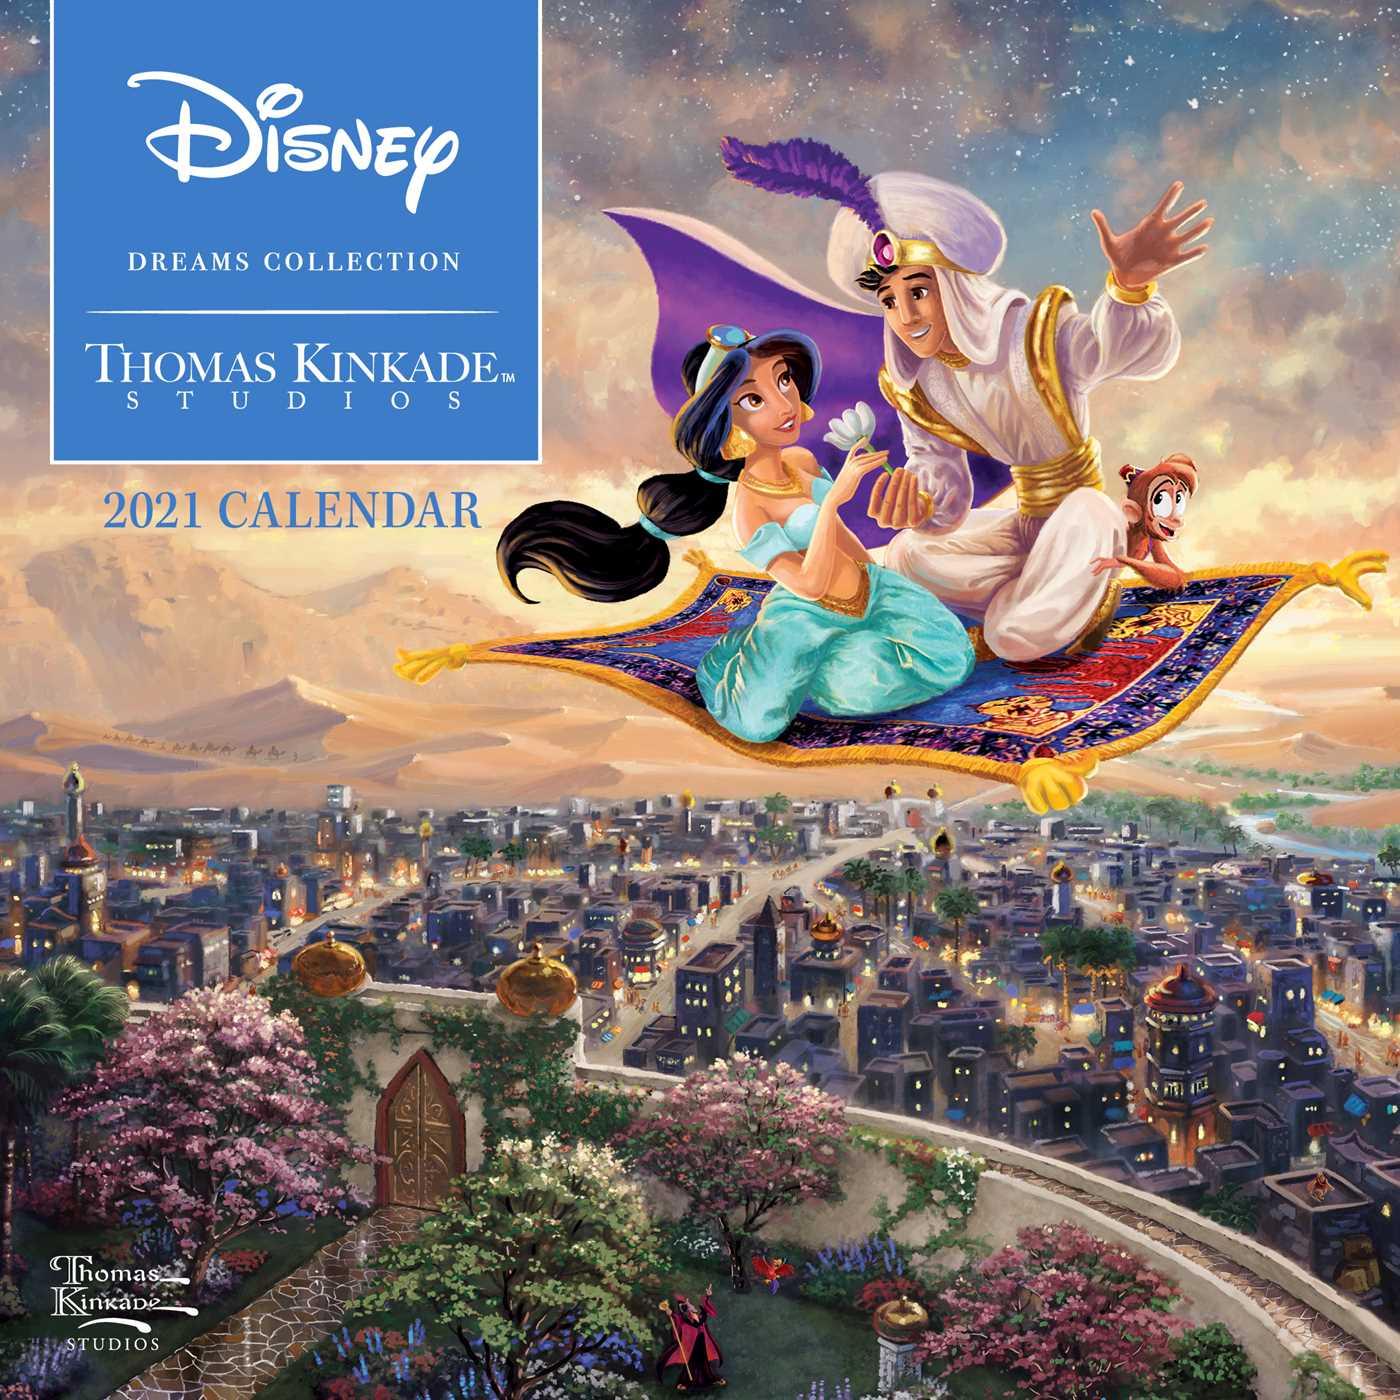 Disney Calendar 2021 Disney Dreams Collection by Thomas Kinkade Studios: 2021 Mini Wall